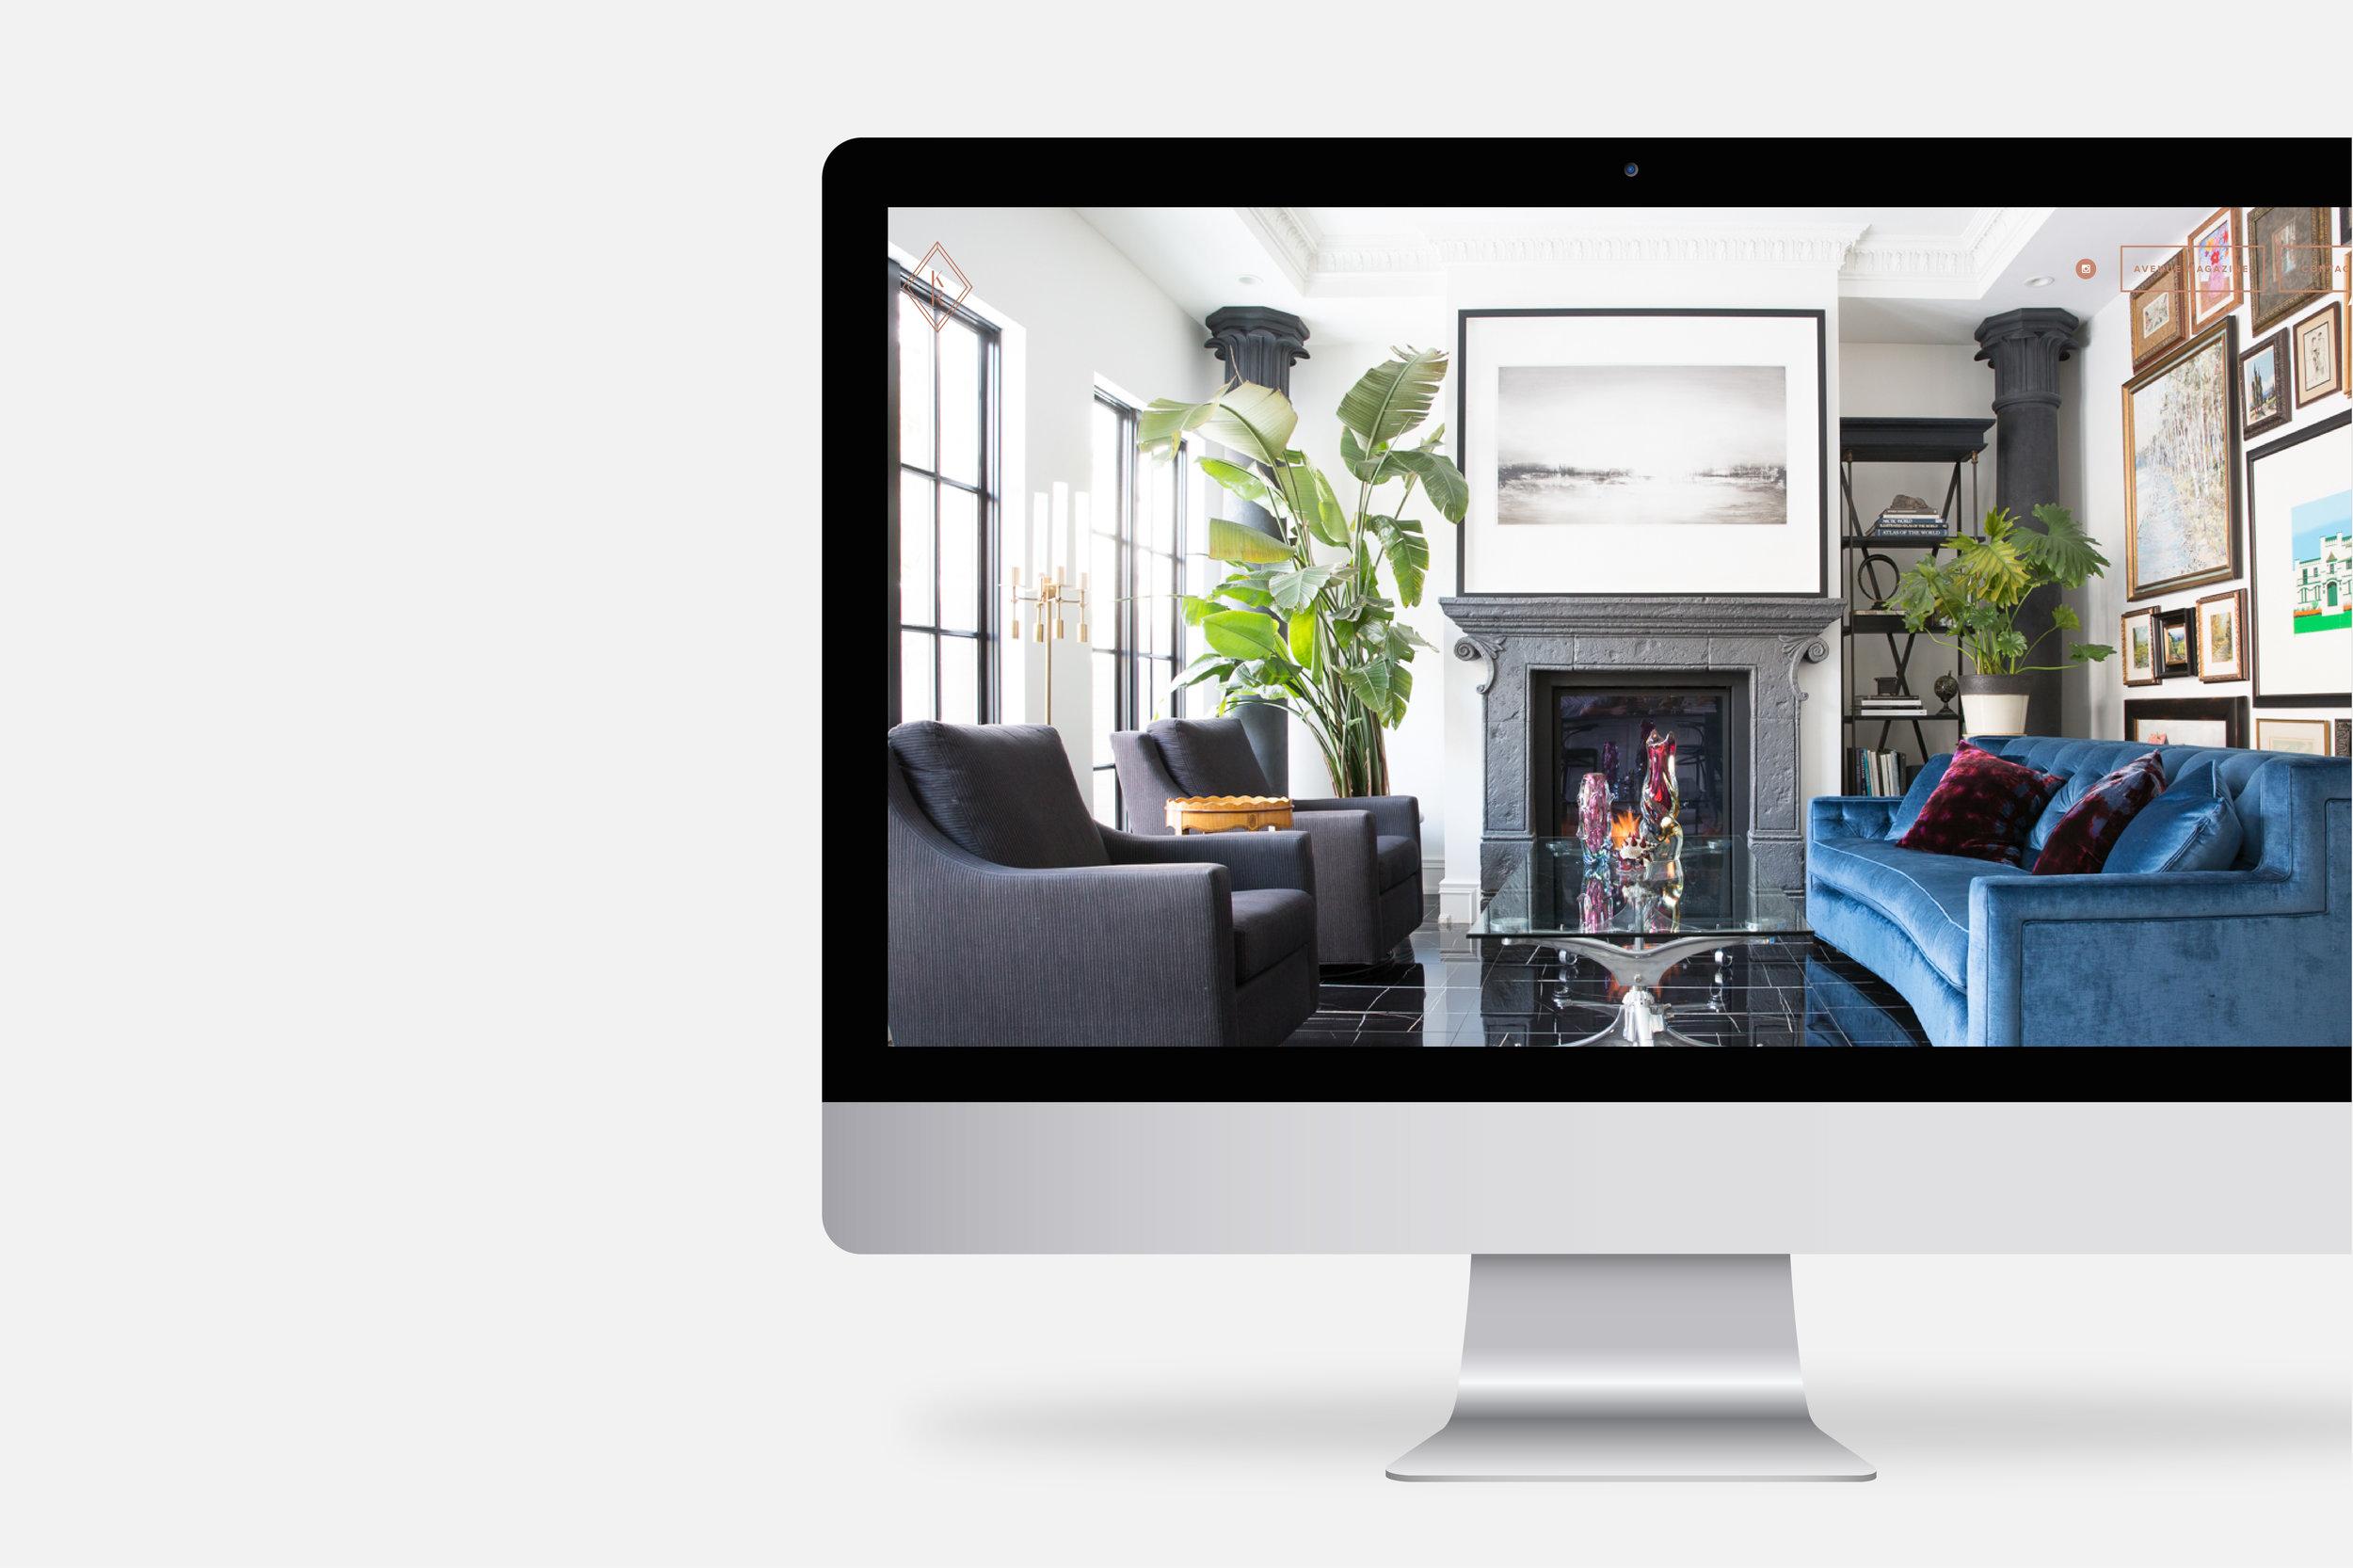 karen-ryan-design-interior-design-calgary-swell-yyc-graphic-design-03.jpg